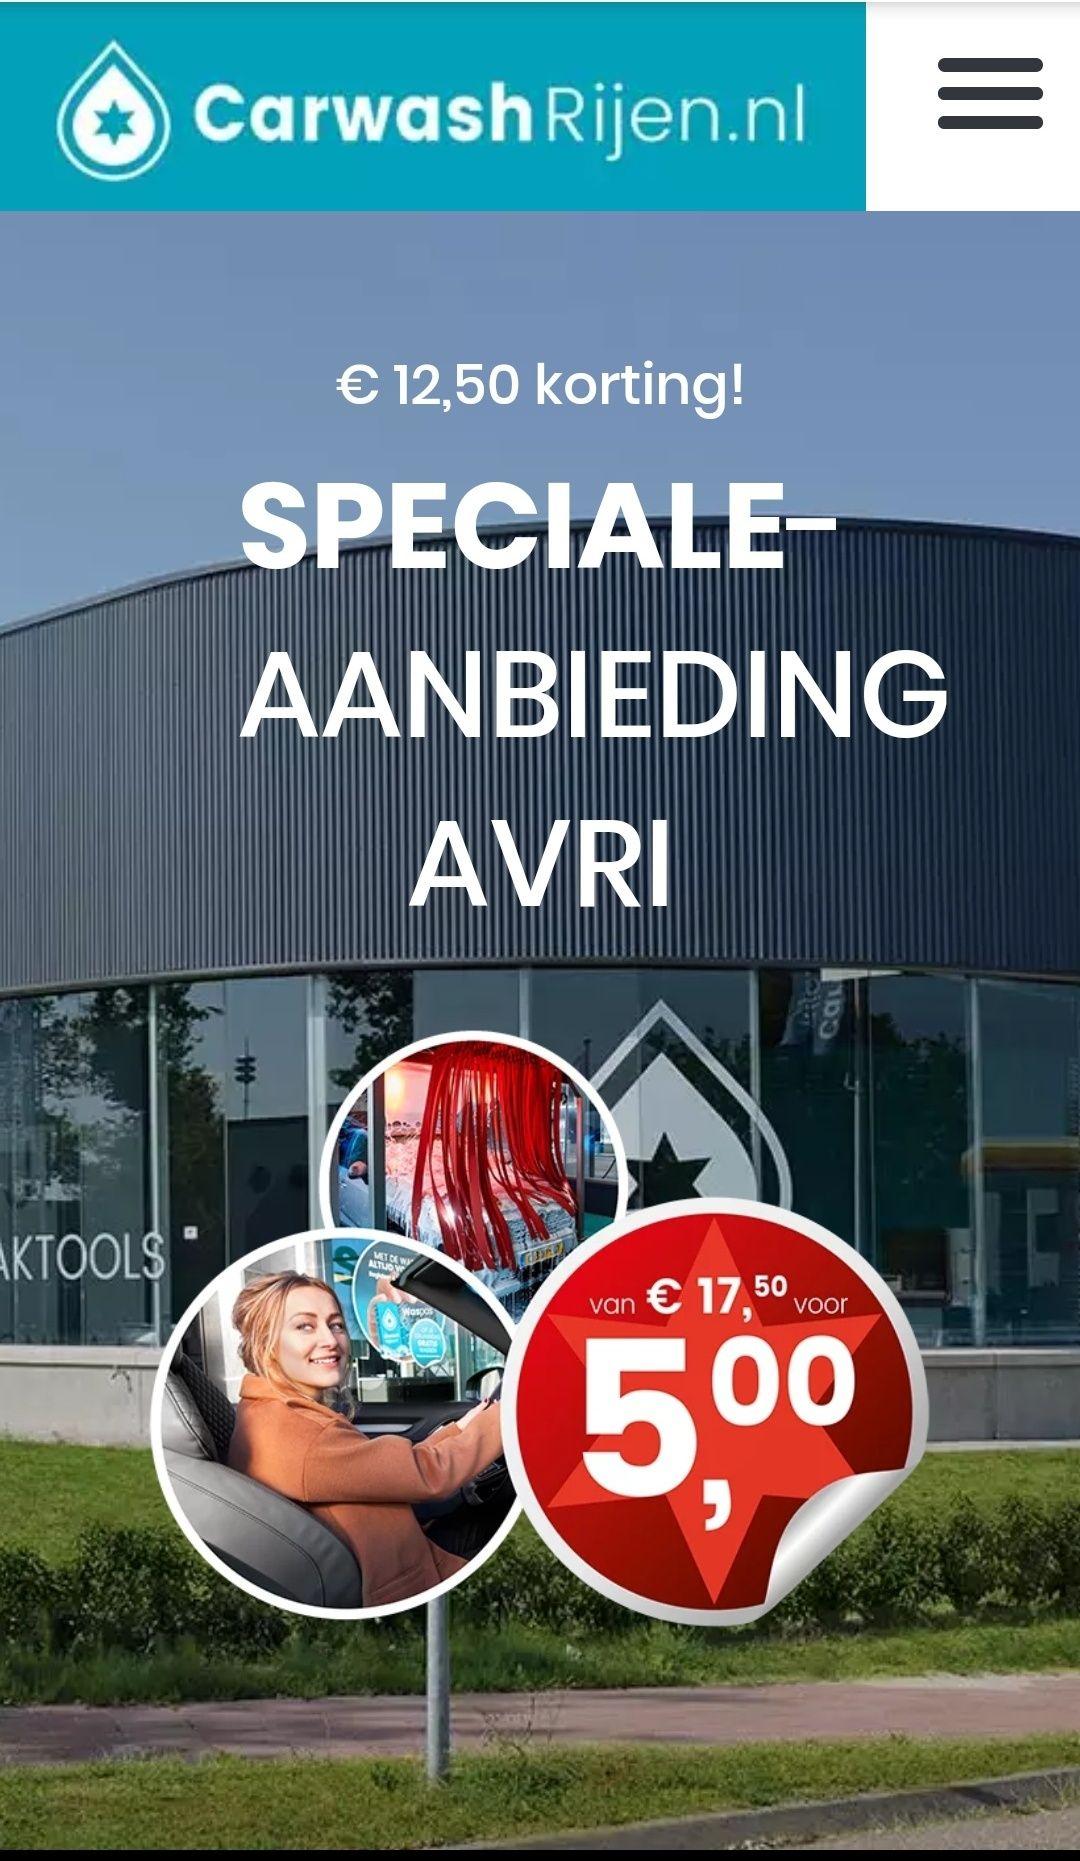 €12.50 korting op het beste wasprogramma @Carwash Rijen